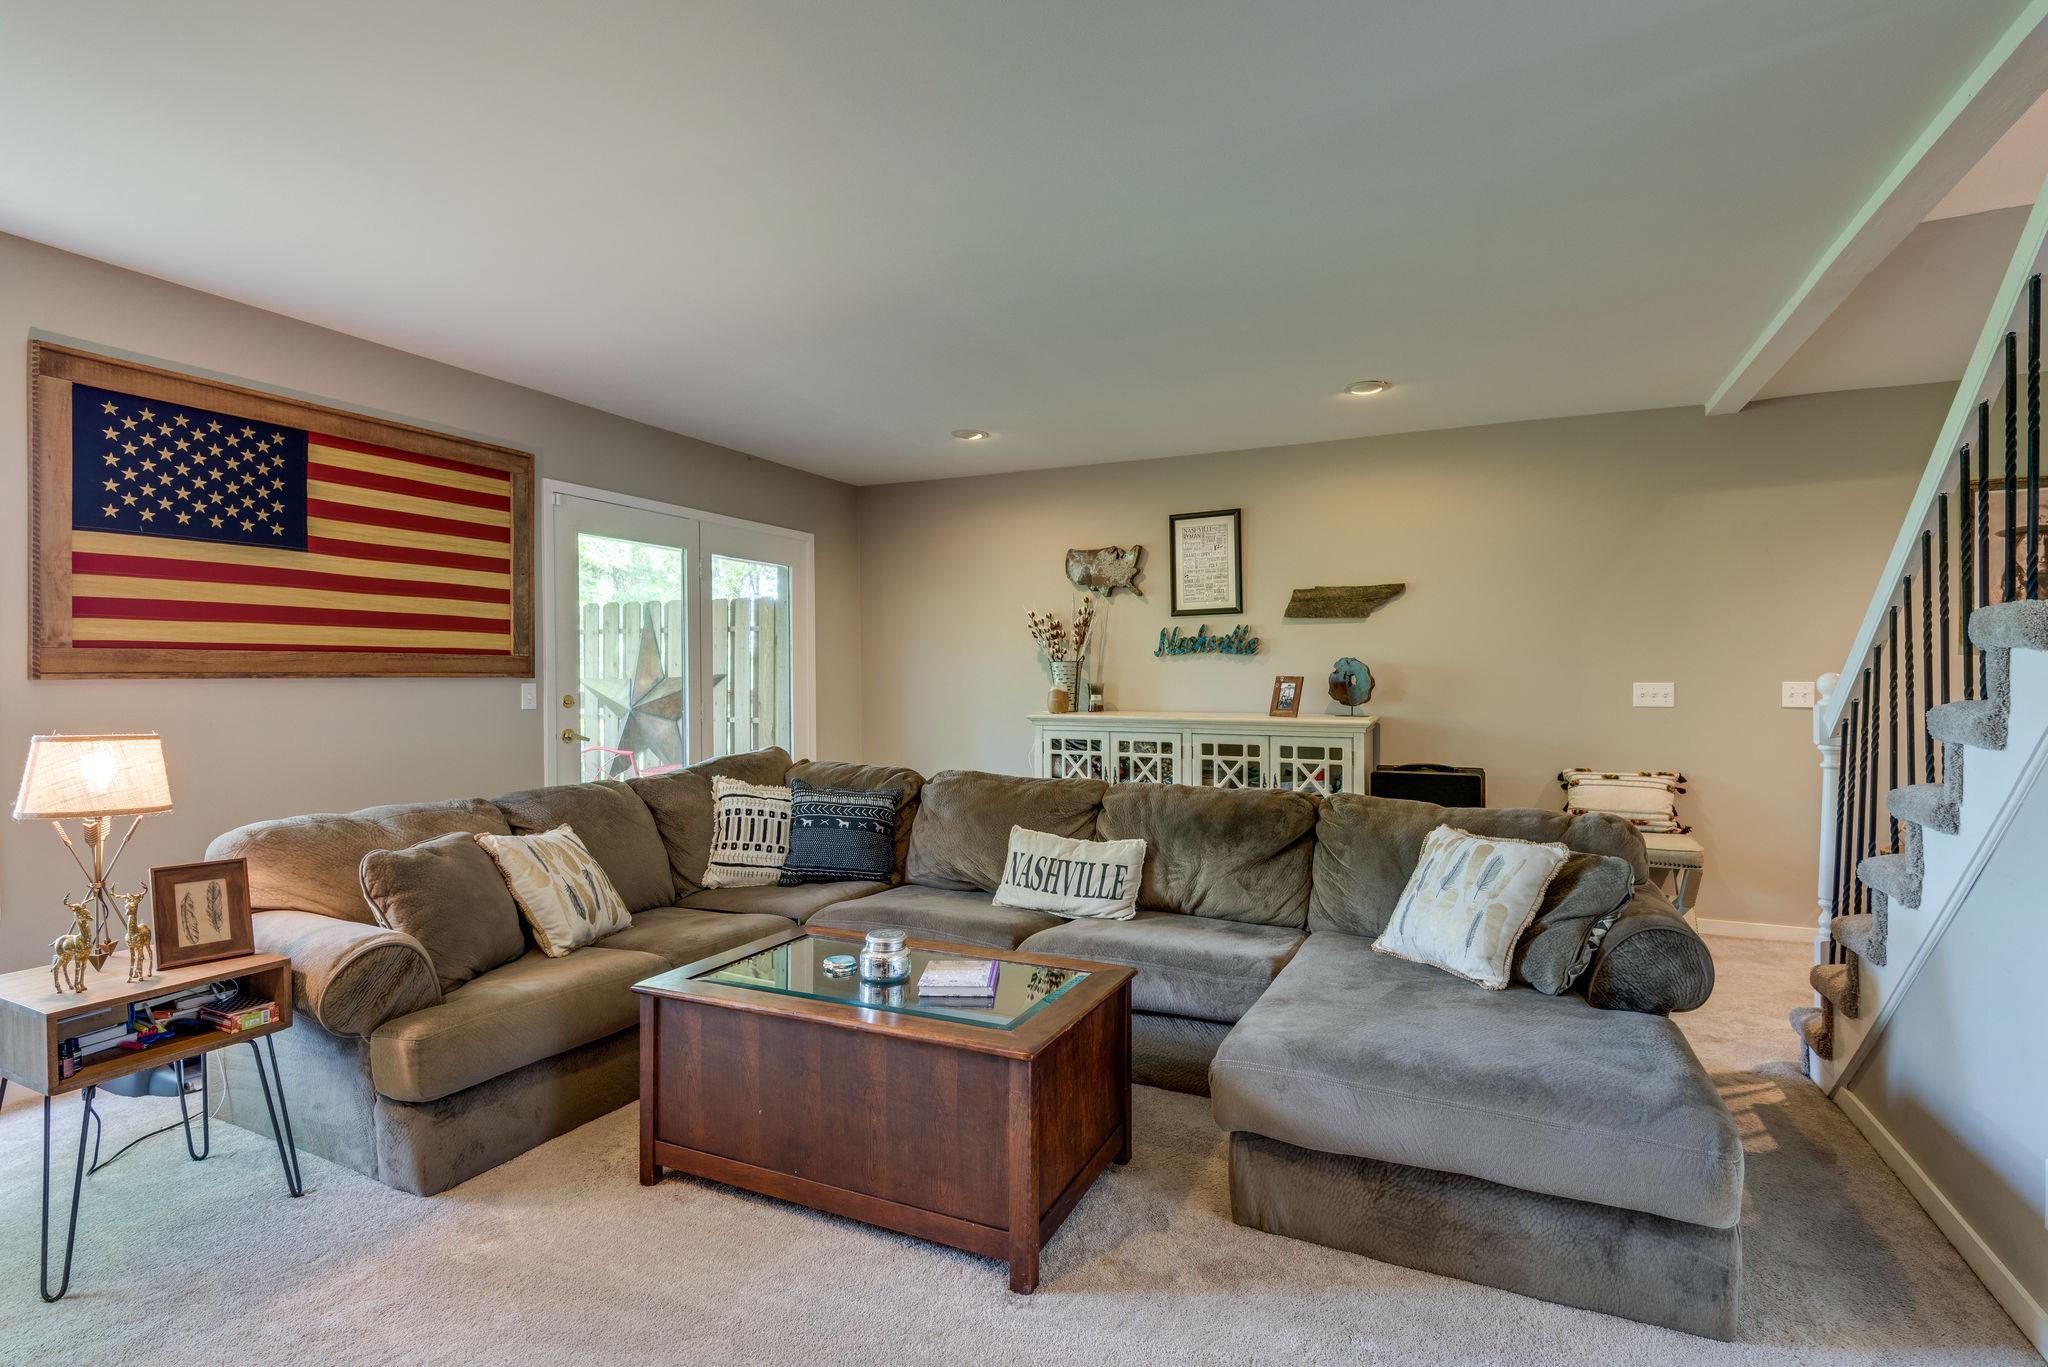 711 Harpeth Trace Drive, Nashville, TN 37221 - Nashville, TN real estate listing